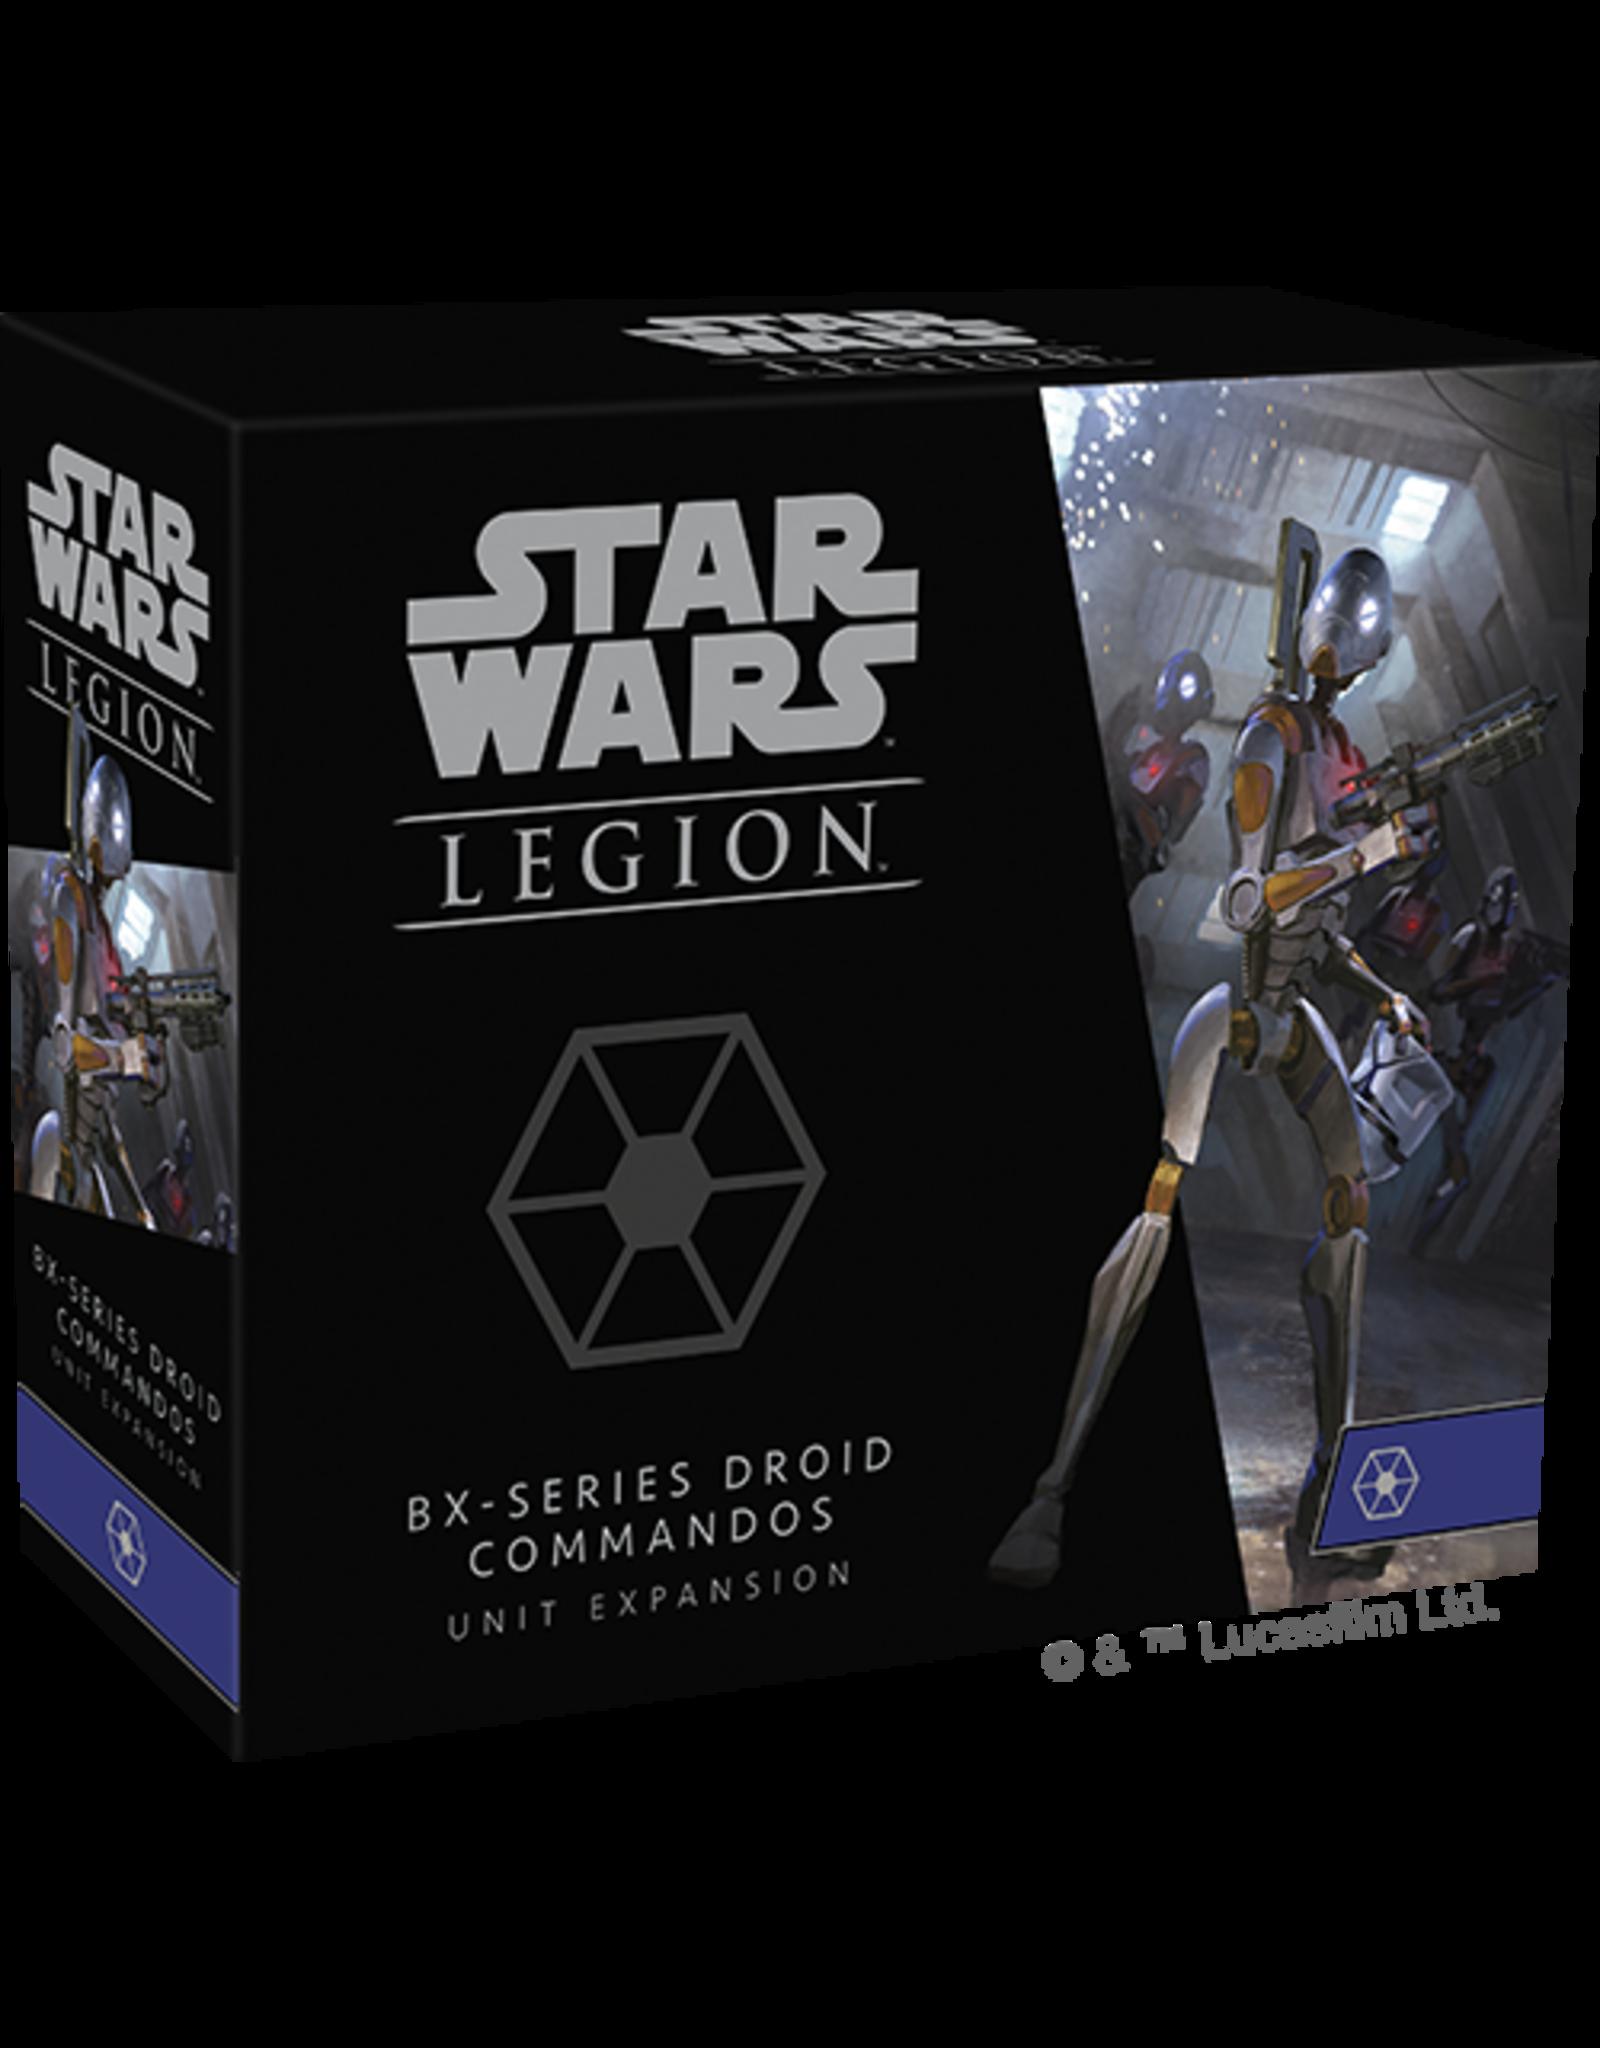 Star Wars Star Wars: Legion - BX-series Droid Commandos